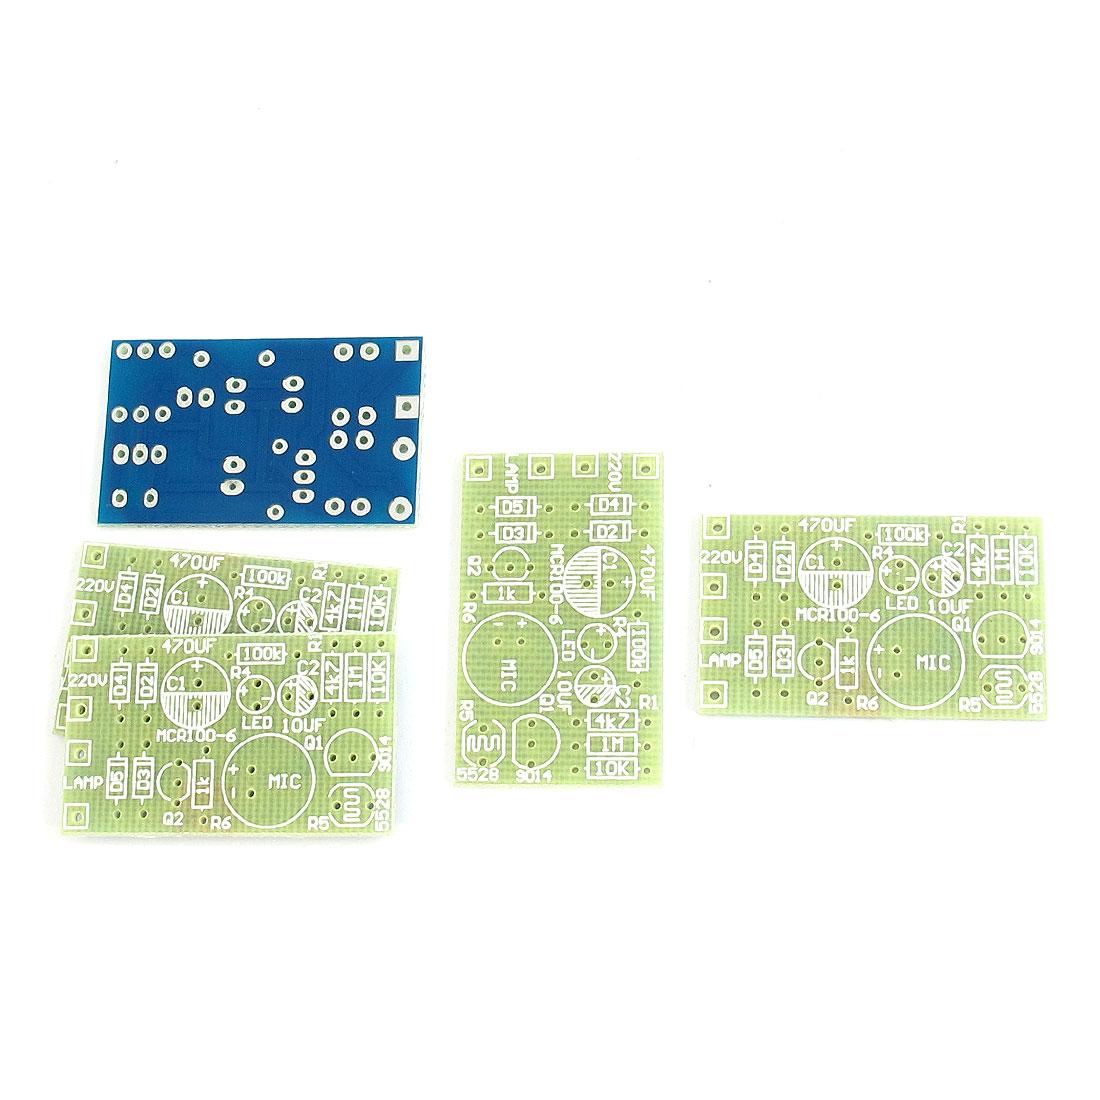 5 Pcs 37mm x 22mm Light Sound Sensor Control Delay ON/OFF Module Switch PCB Blank Board